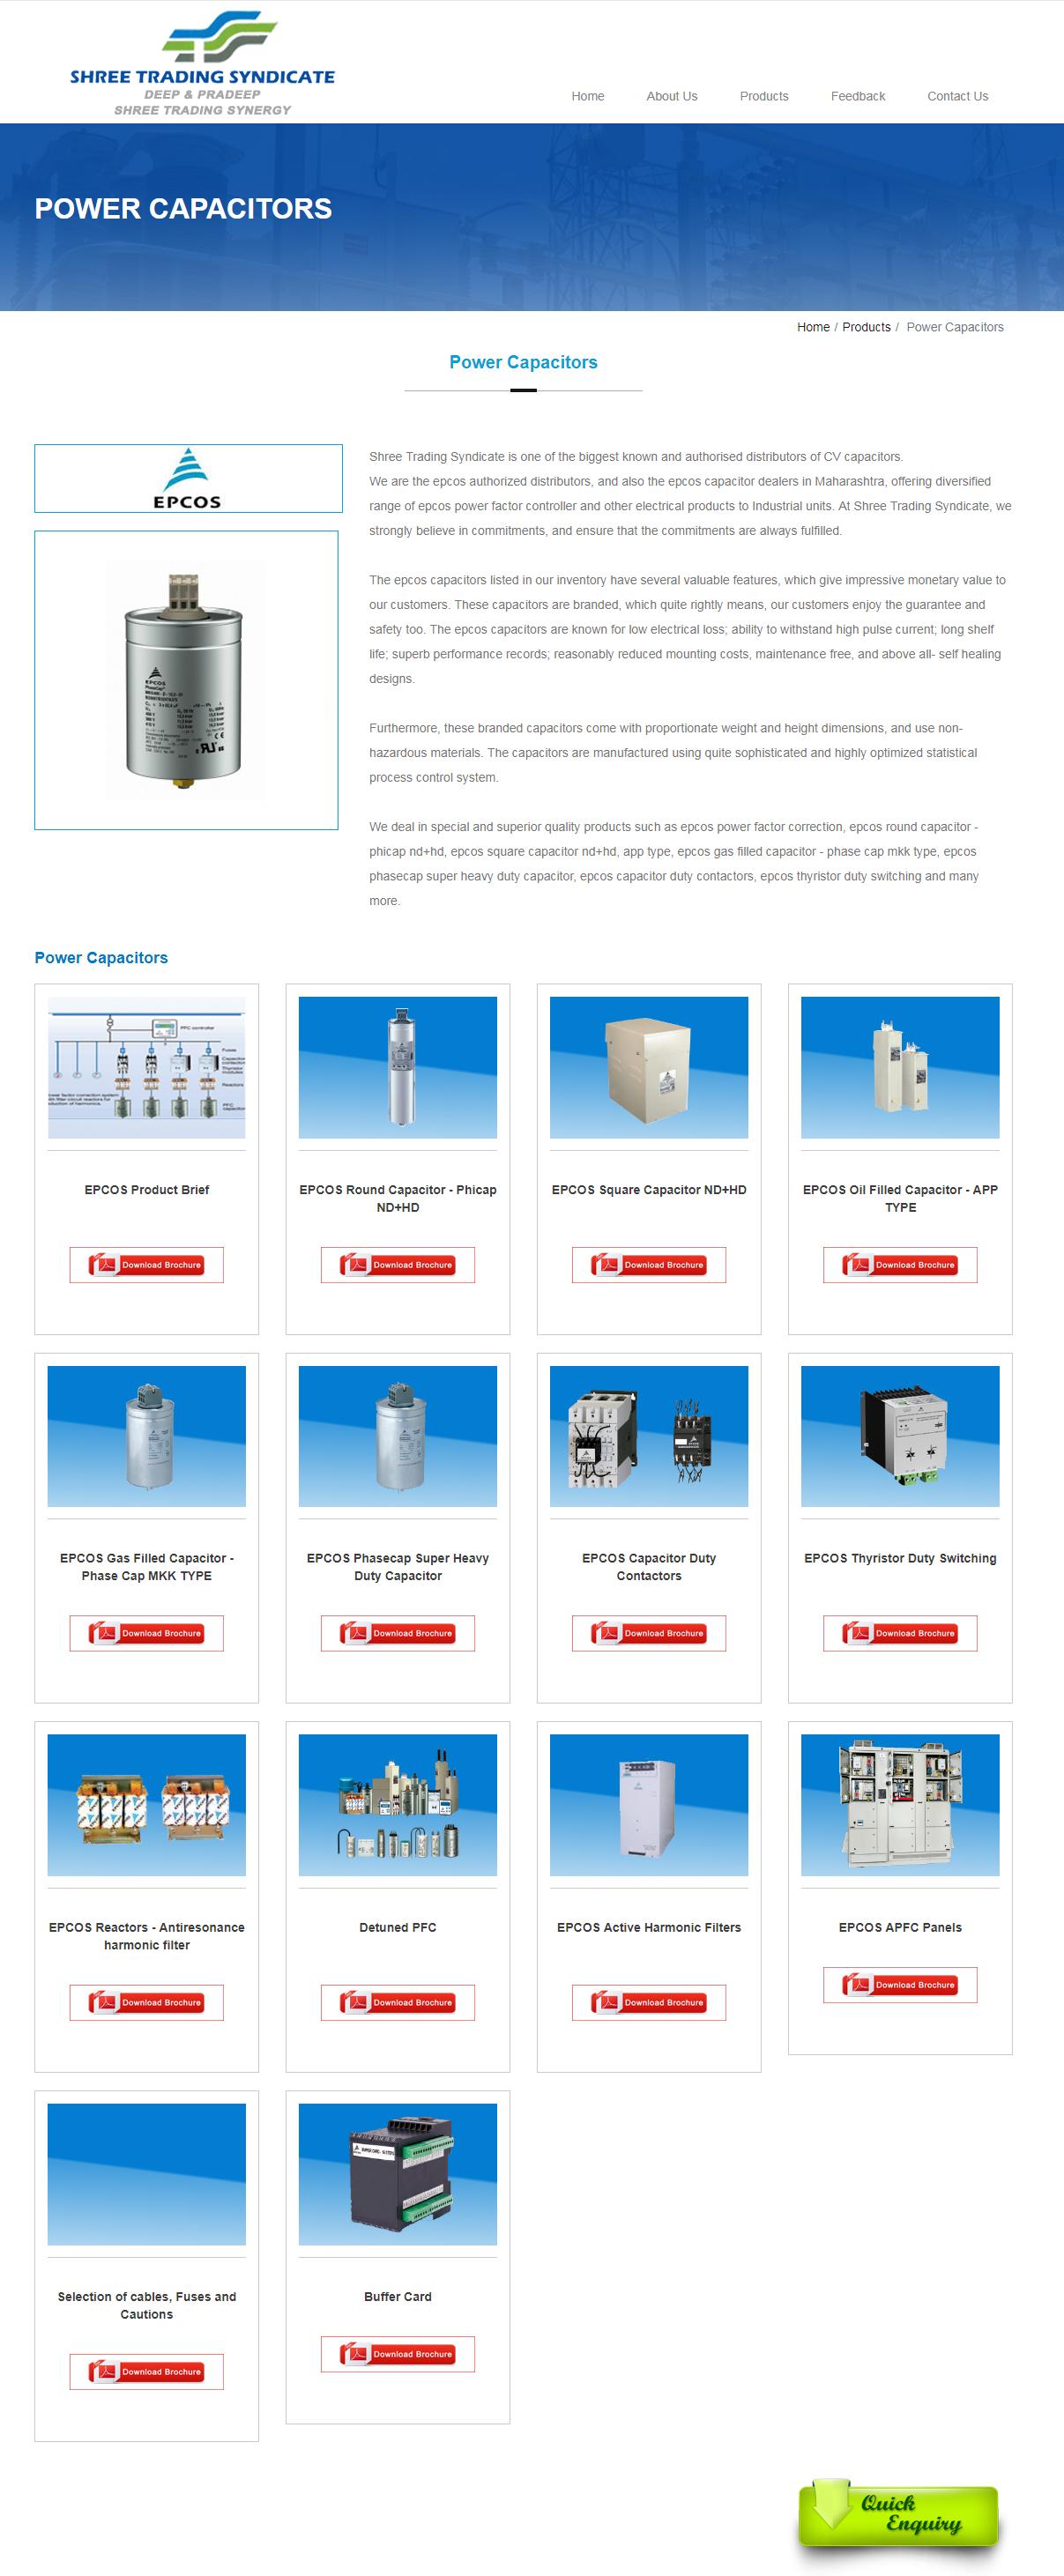 Epcos Power Capacitor Cv Capacitors Distributor Dealer Mumbai India Capacitors Capacitor Process Control